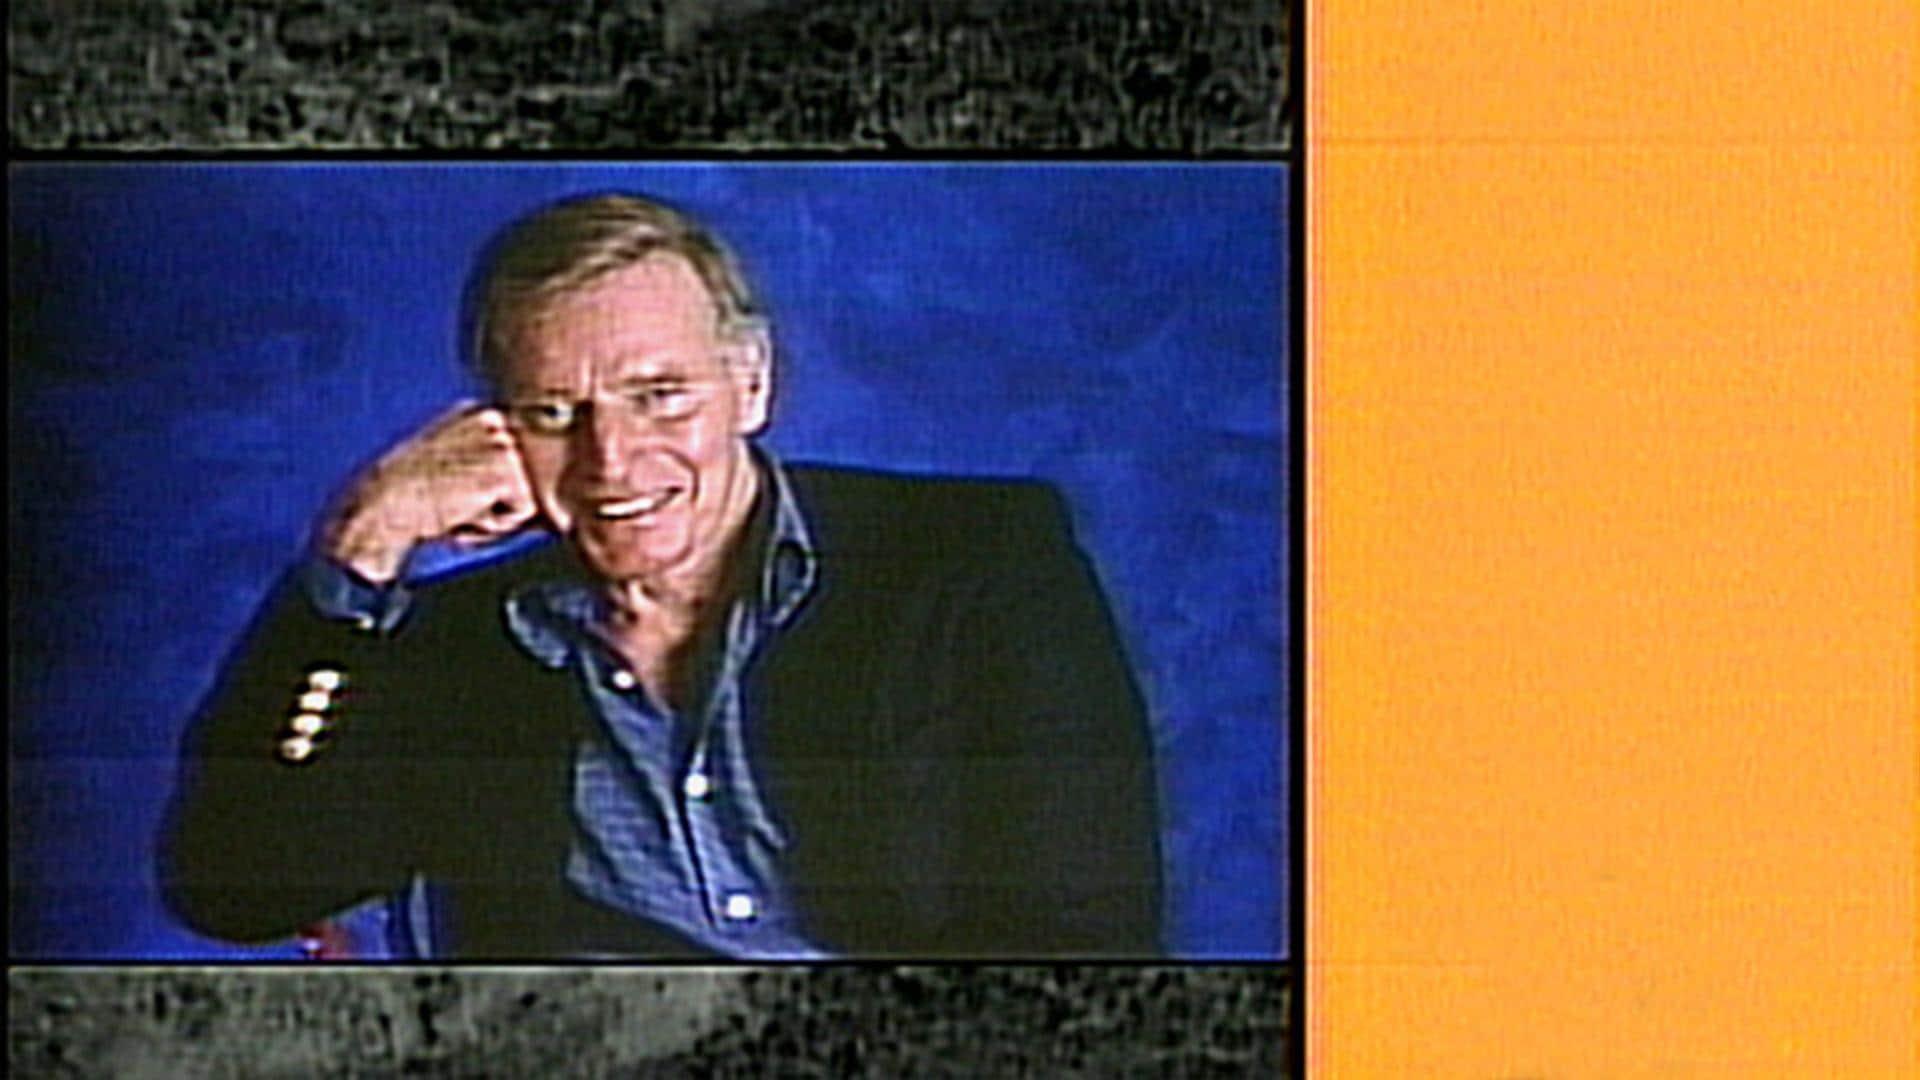 Charlton Heston: March 28, 1987